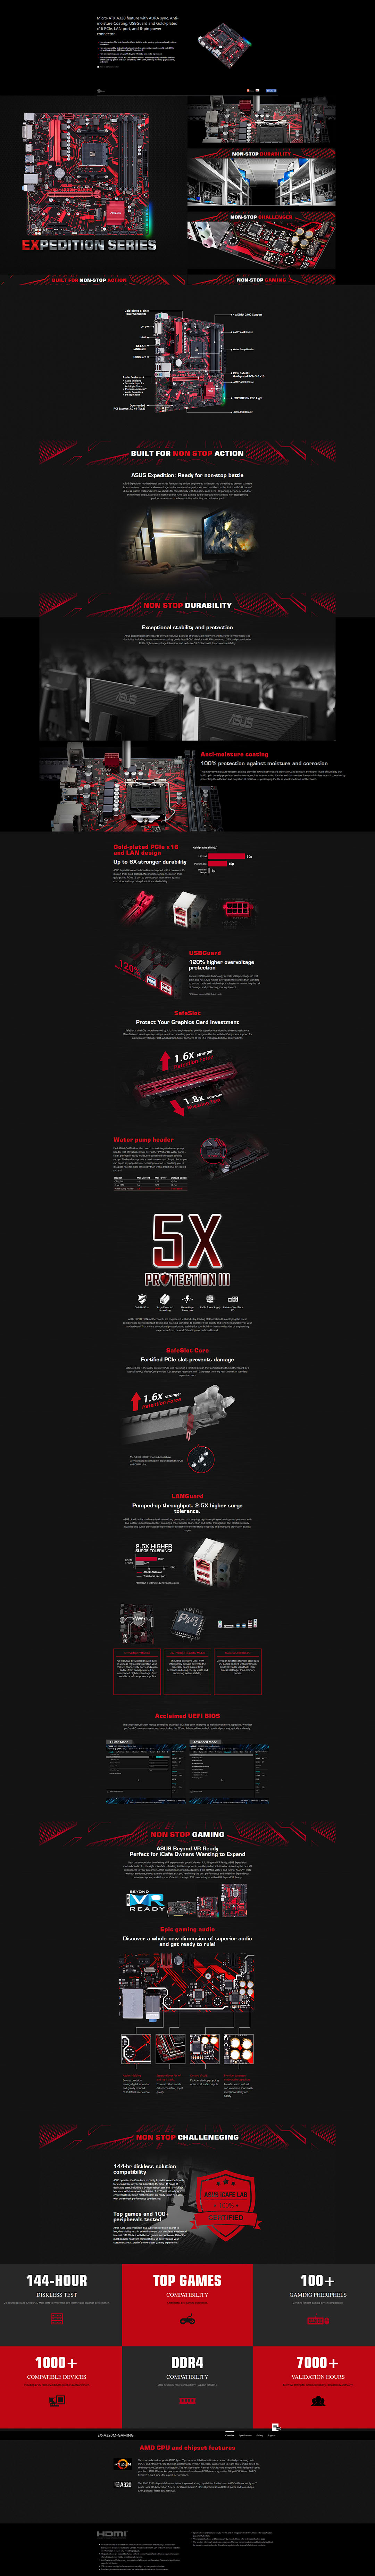 screenshot-2018-1-8-ex-a320m-gaming-motherboards-asus-global